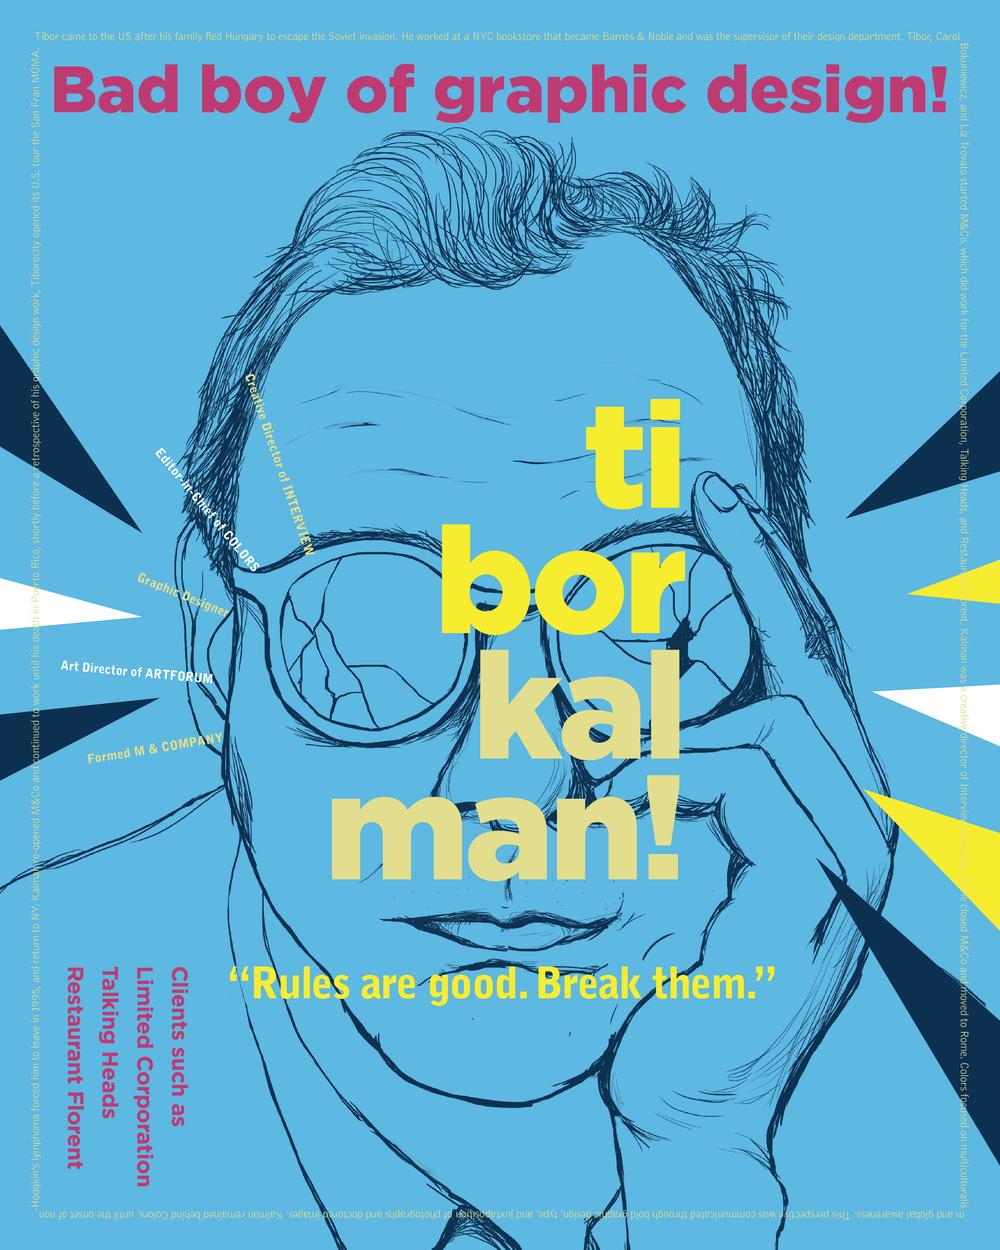 Tibor Kalman Designer Poster 02.14.172.png